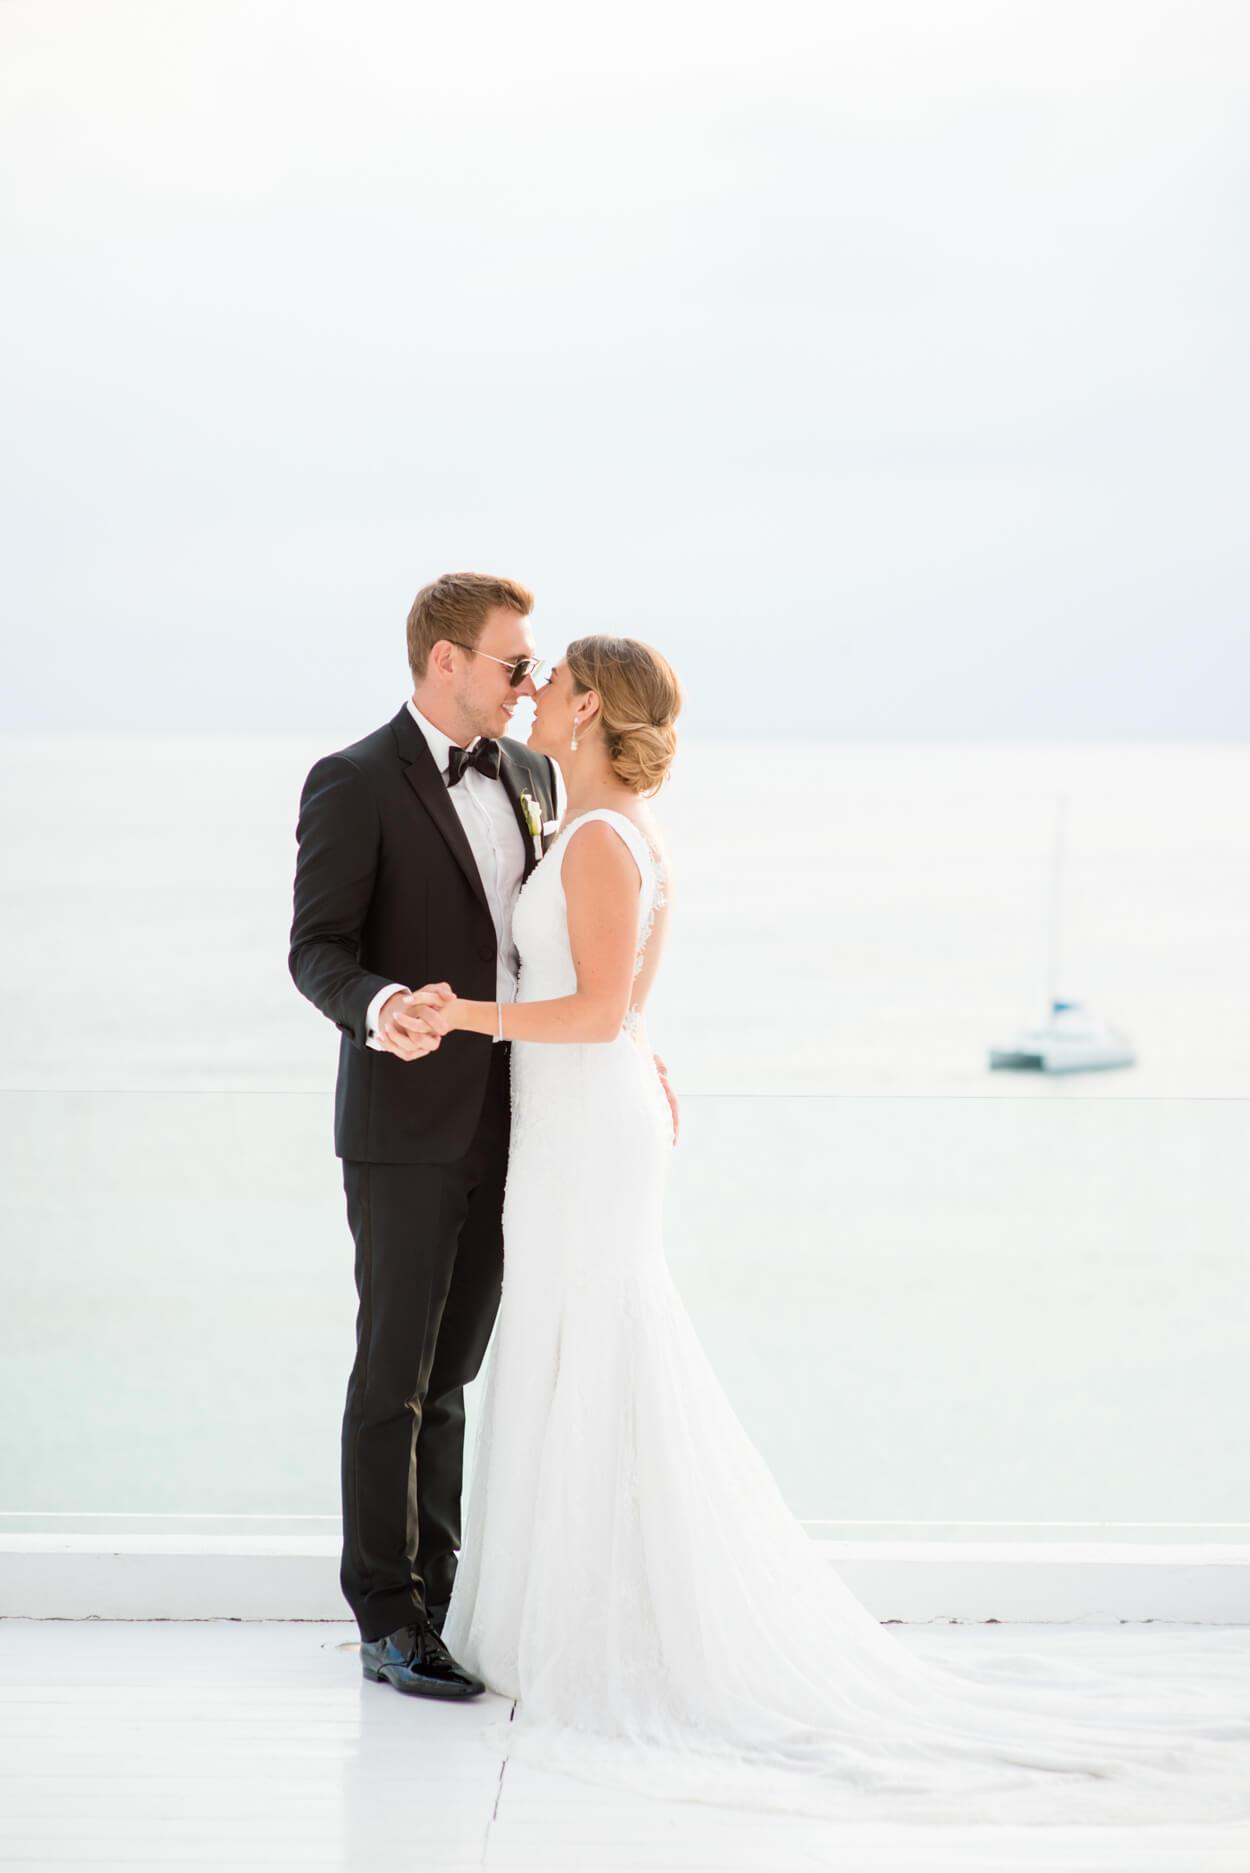 couple portrait bride groom seaside venue horizon